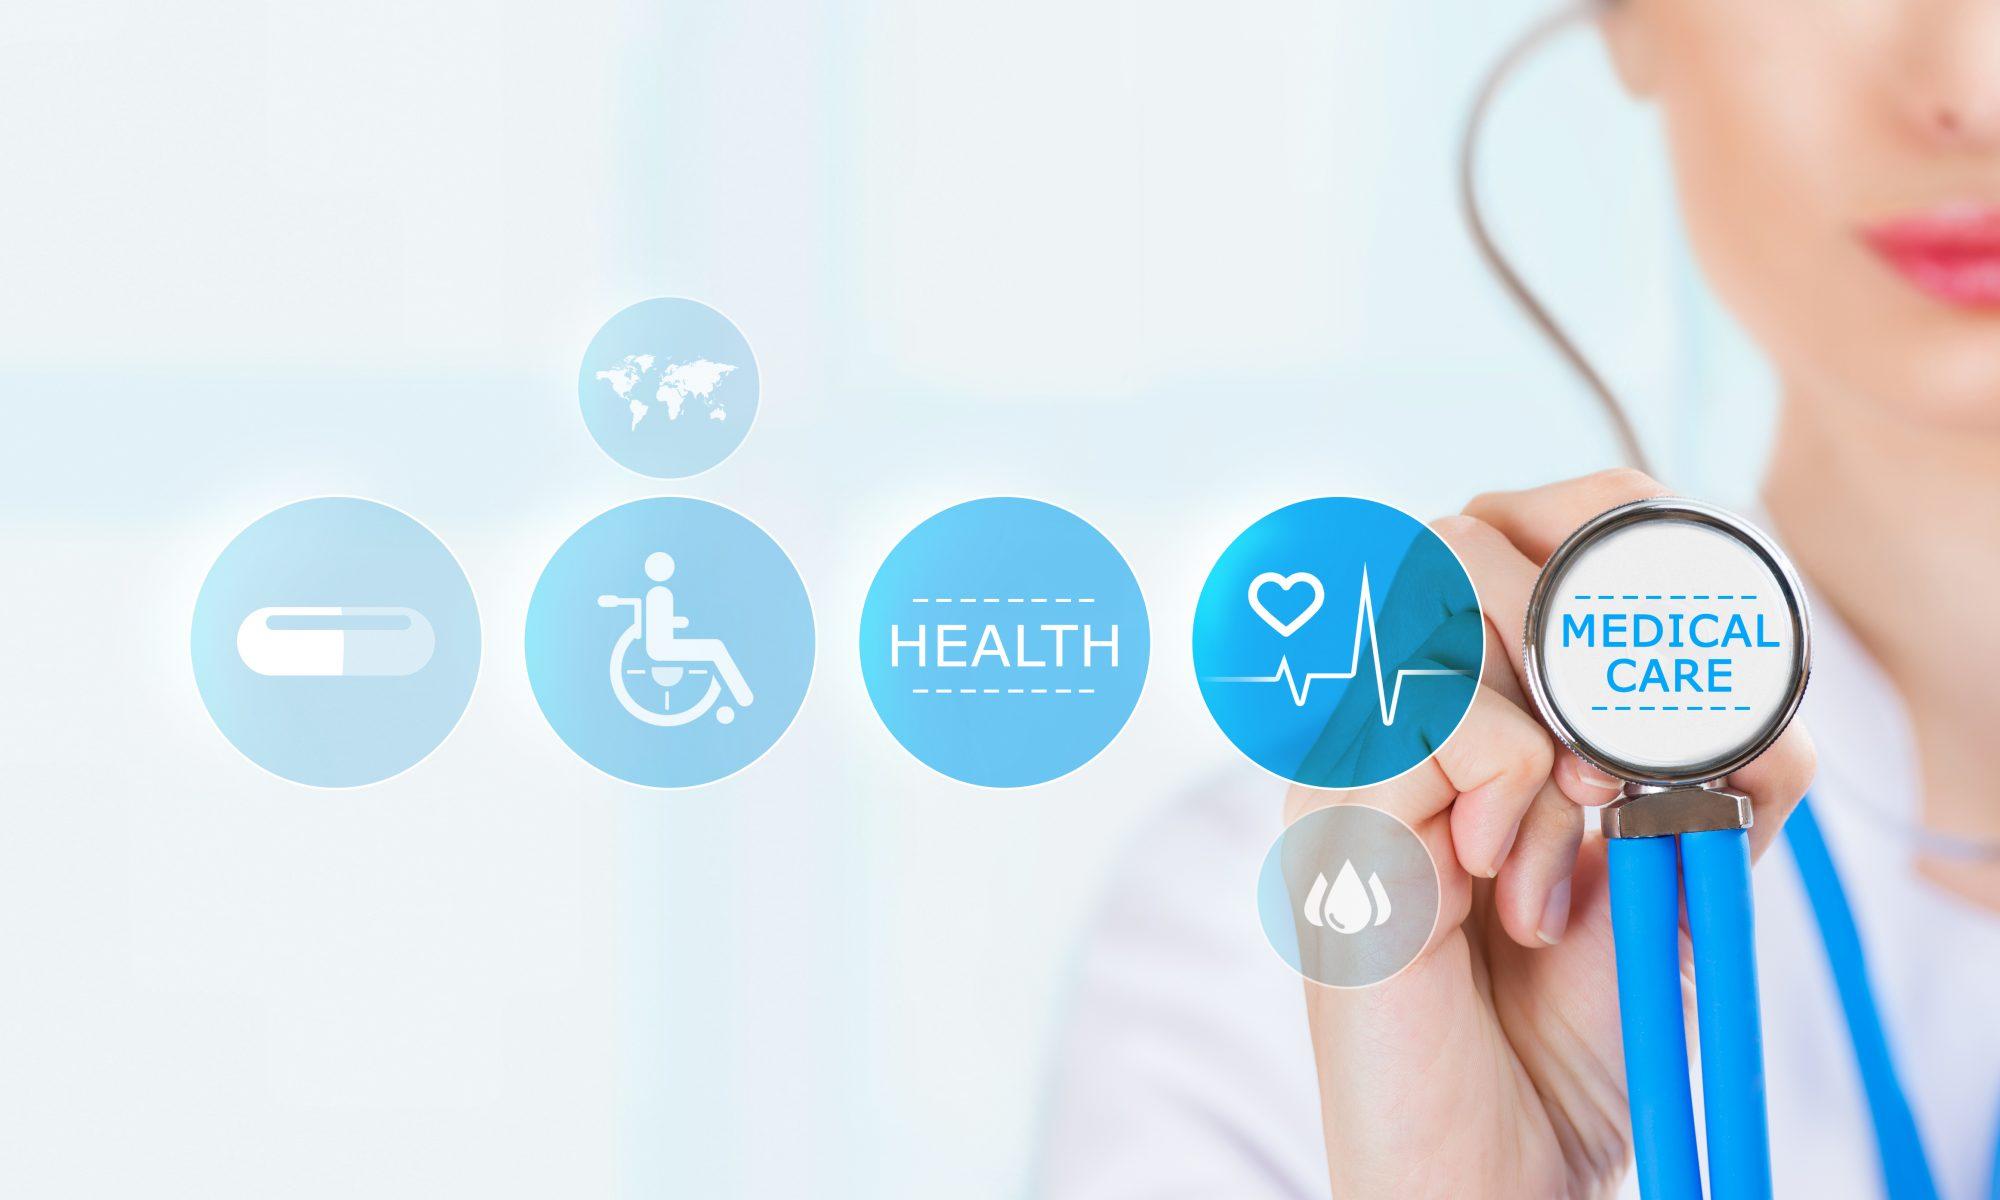 Medical-Spisak ordinacija sportske medicine po gradovima